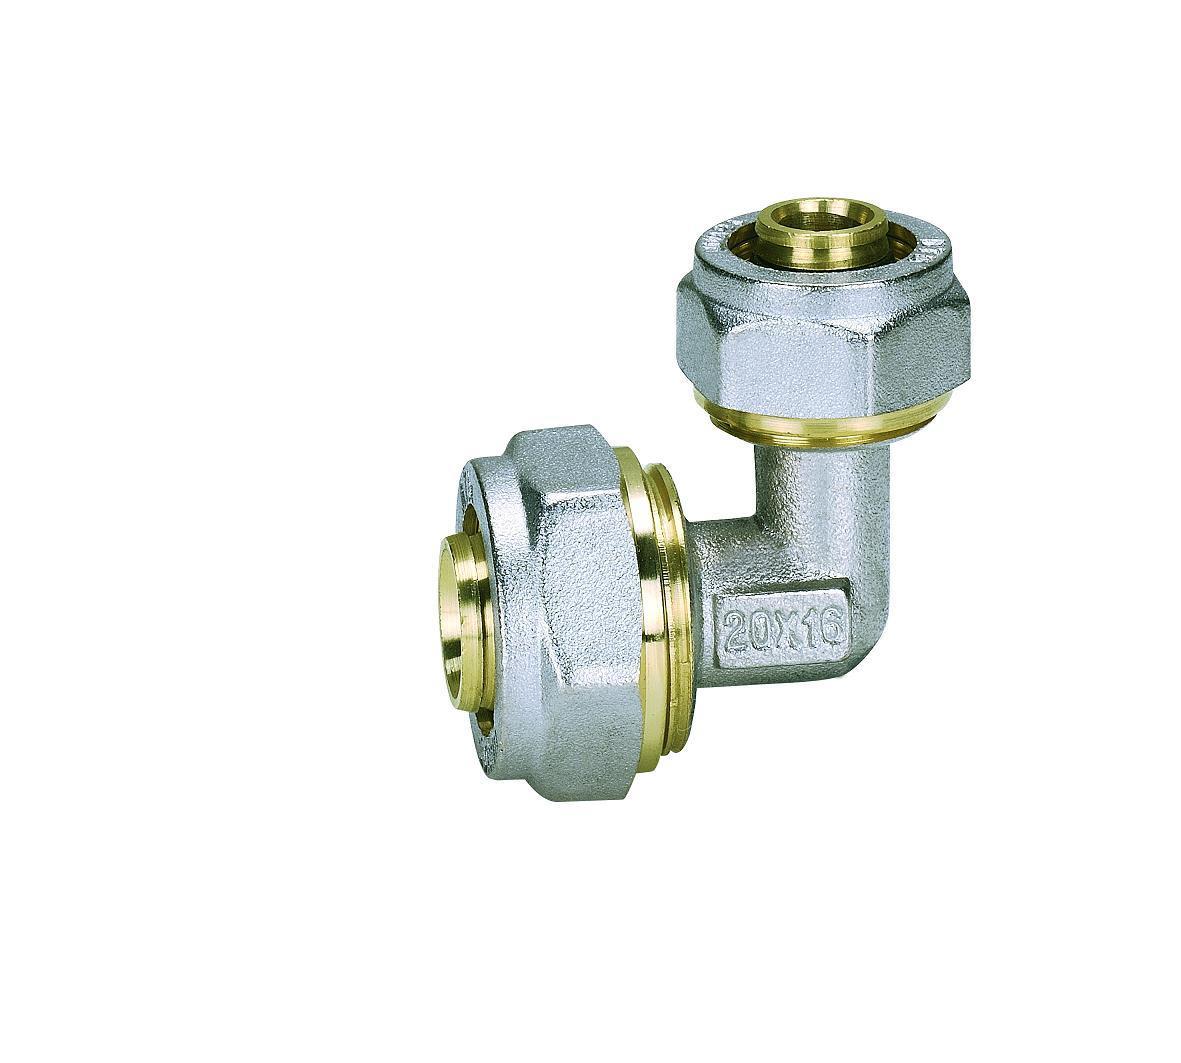 Ktm Reducing Elbow (Hz8016) of Pipe Fittings for Pert-Al-Pert Pipe, Pex-Al-Per Pipe, Aluminium Plastic Pipe